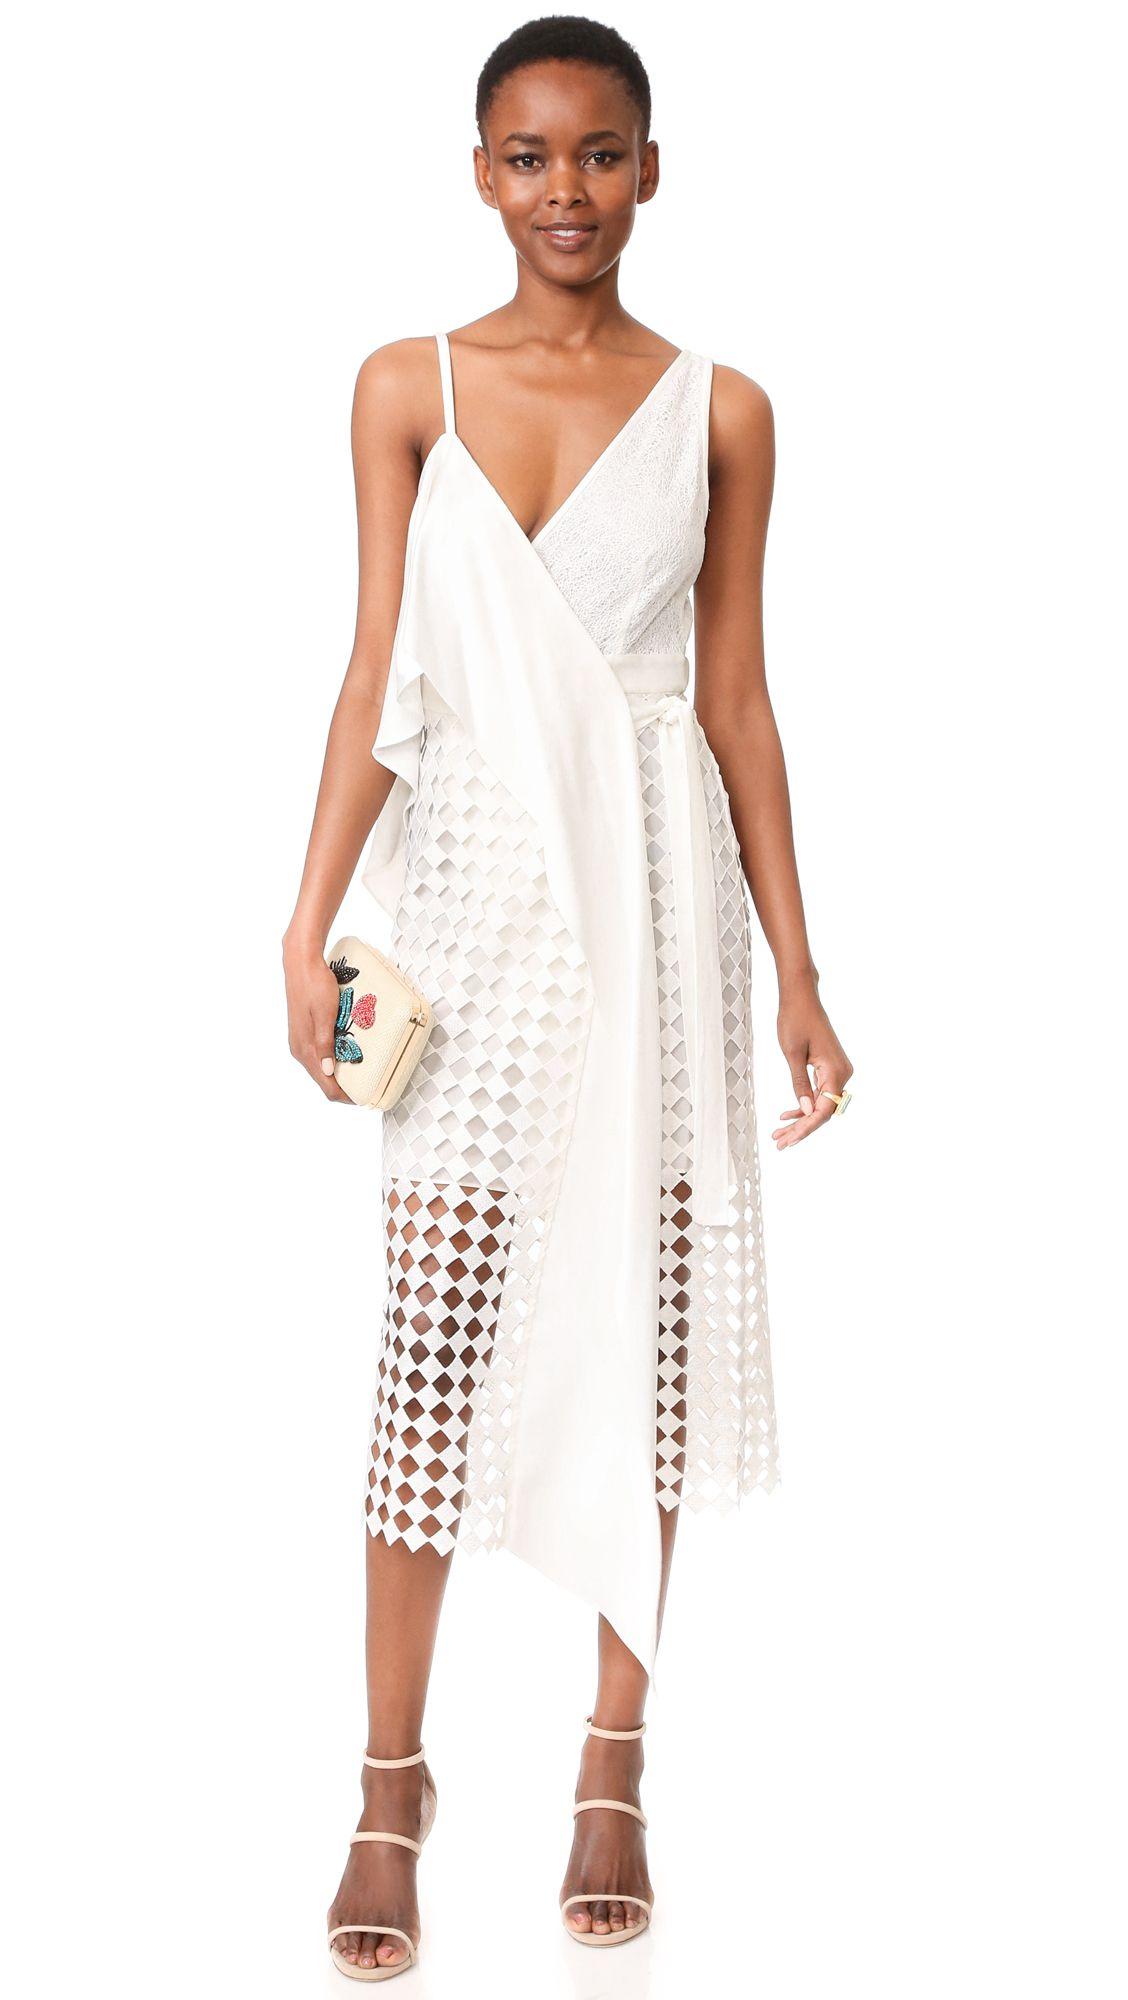 A model wearing a white cut out dress